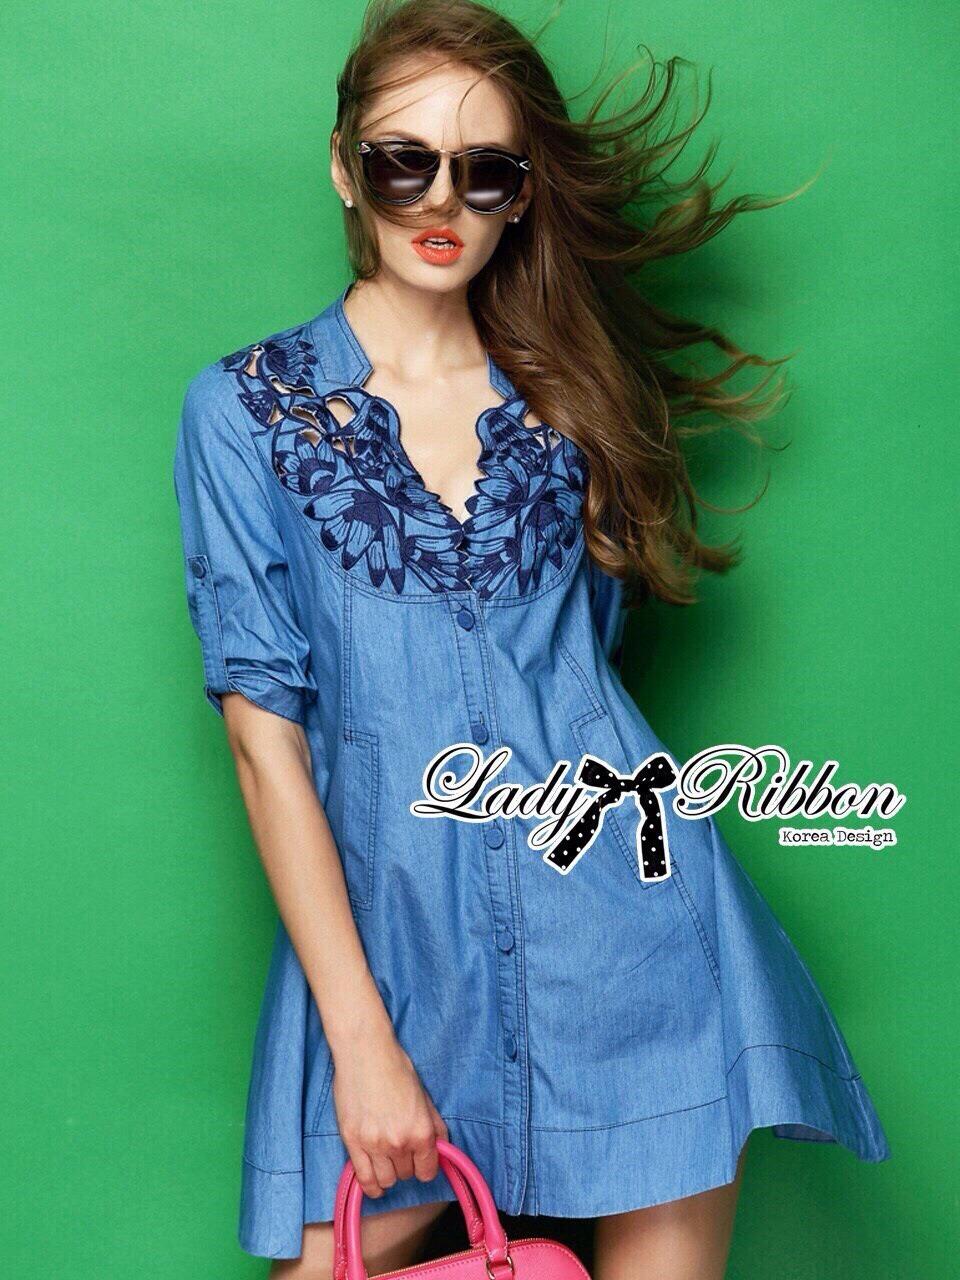 Lady Rosalie Smart Chic Embroidered Denim Shirt Dress